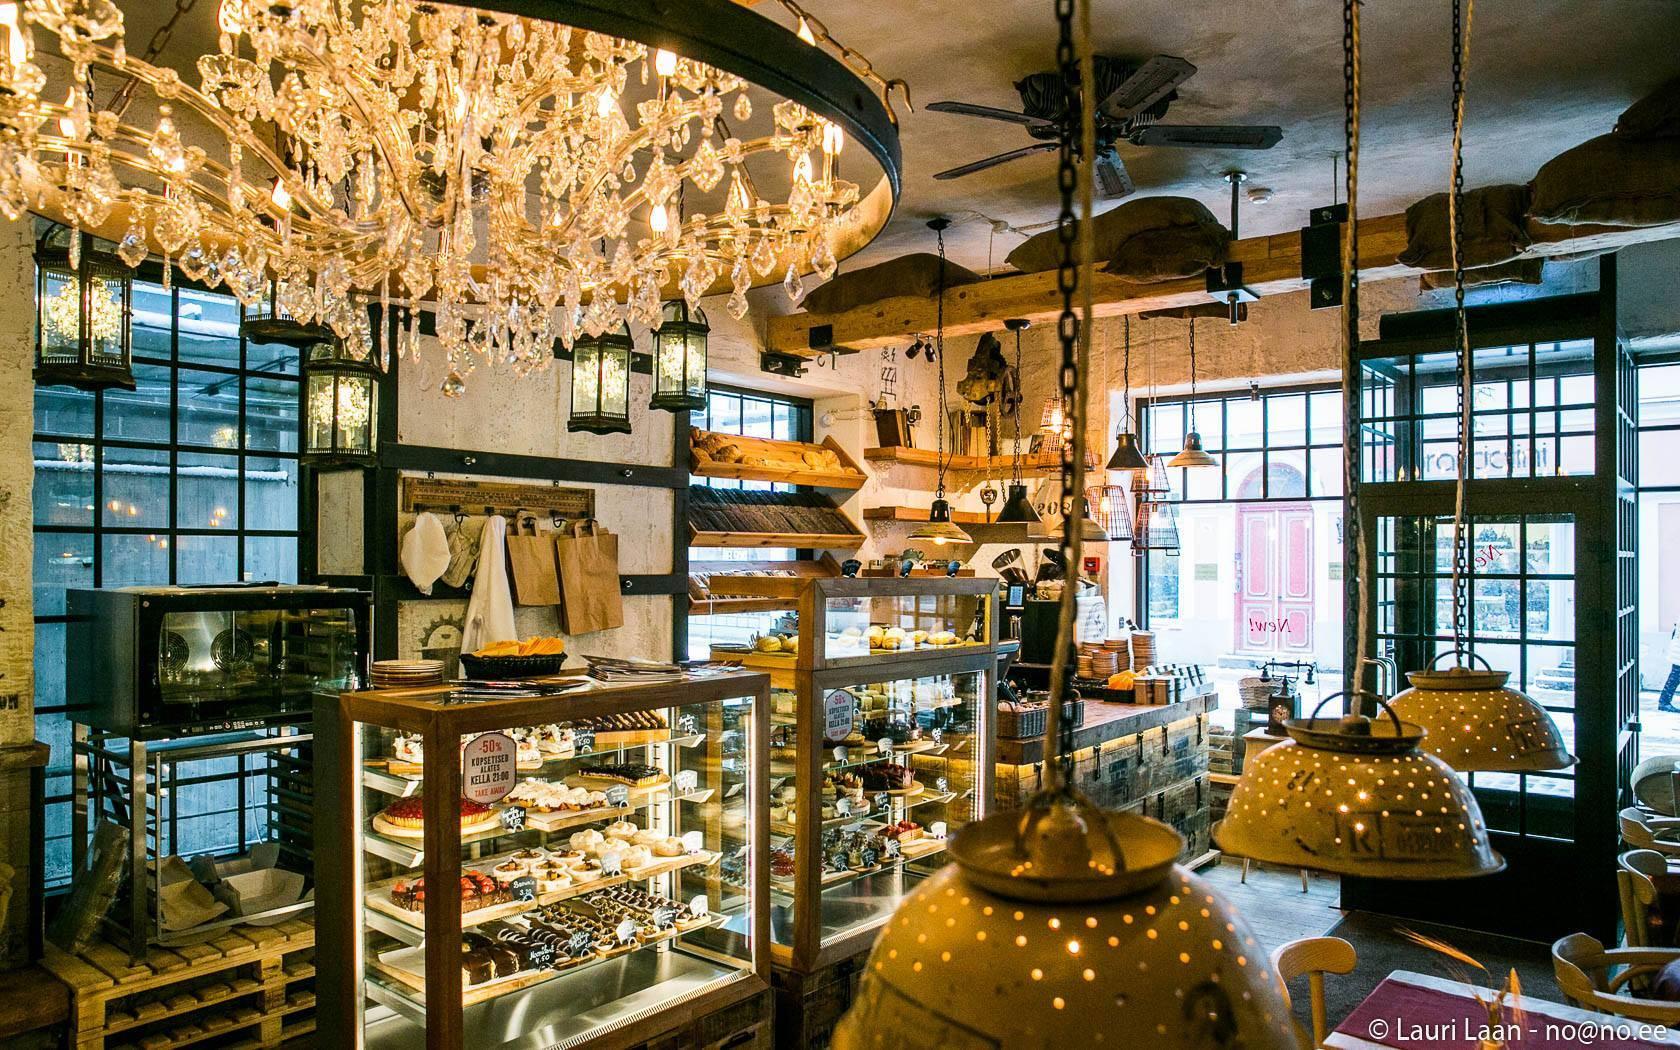 Interior of Rukis café in the Old Town of Tallinn, Estonia